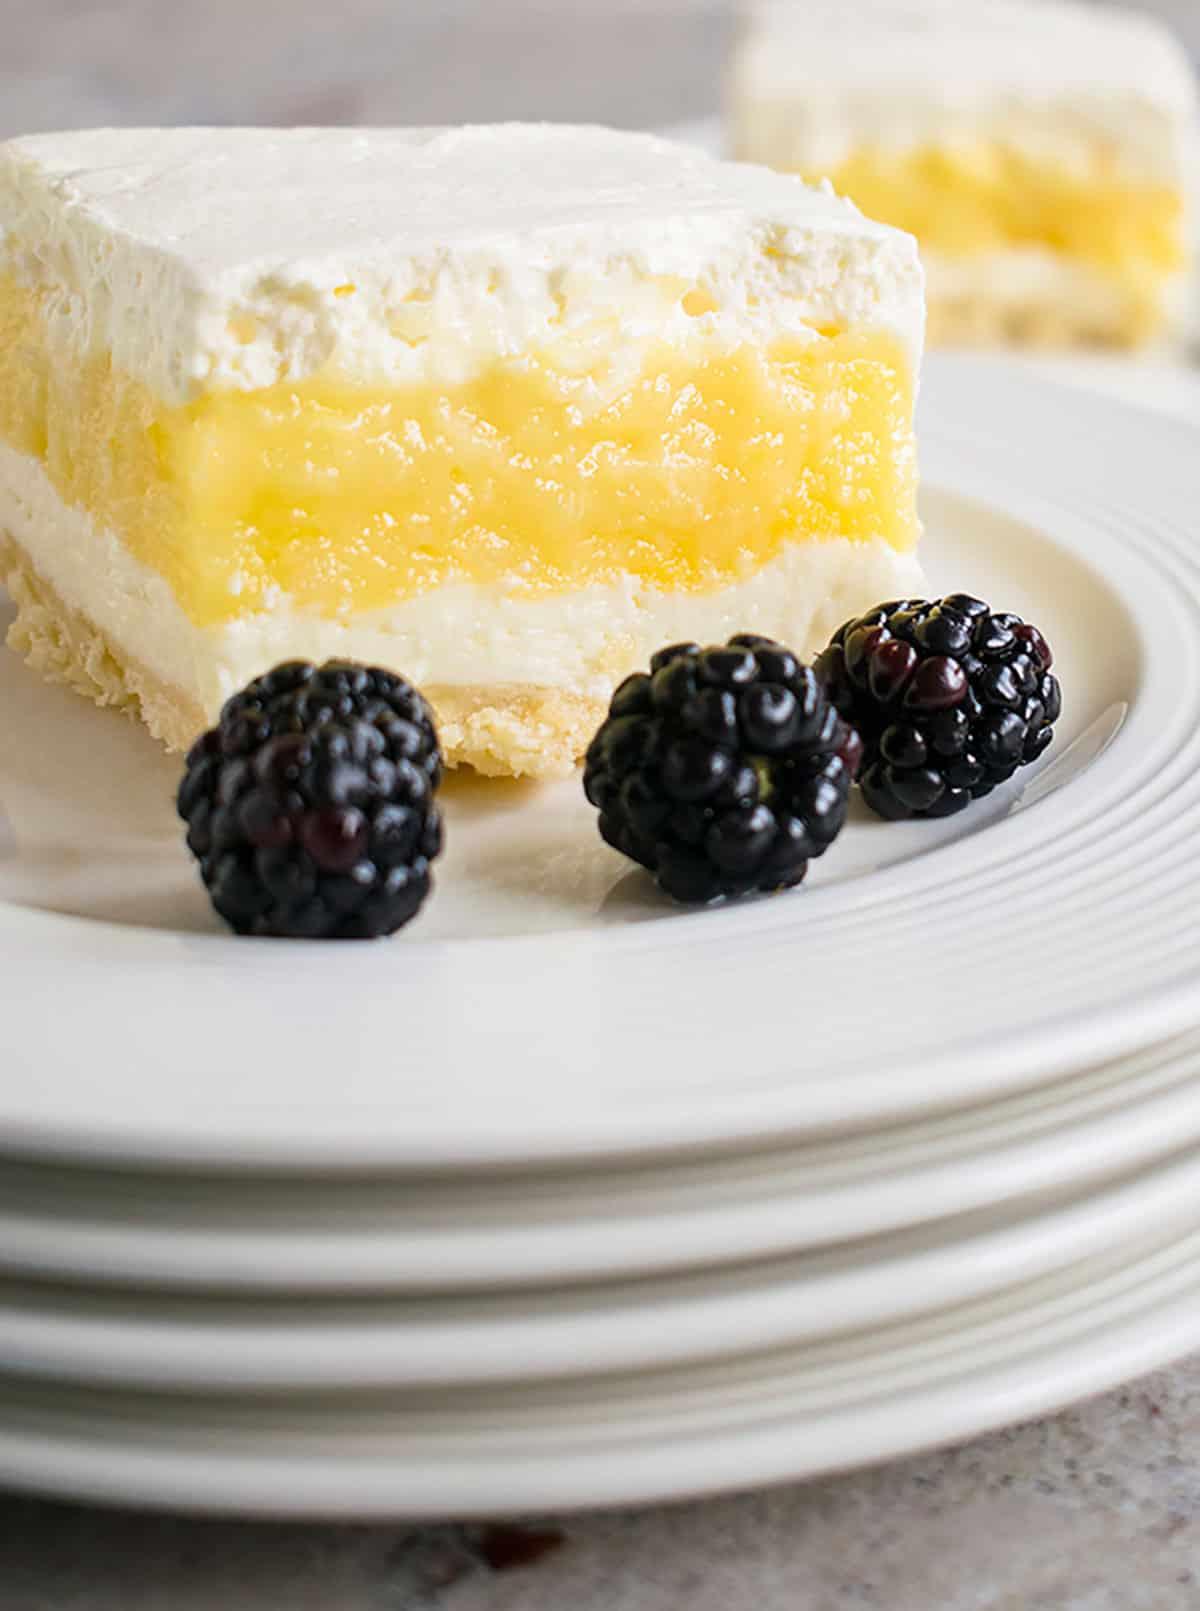 slice of lemon lush on stack of plates with blackberries